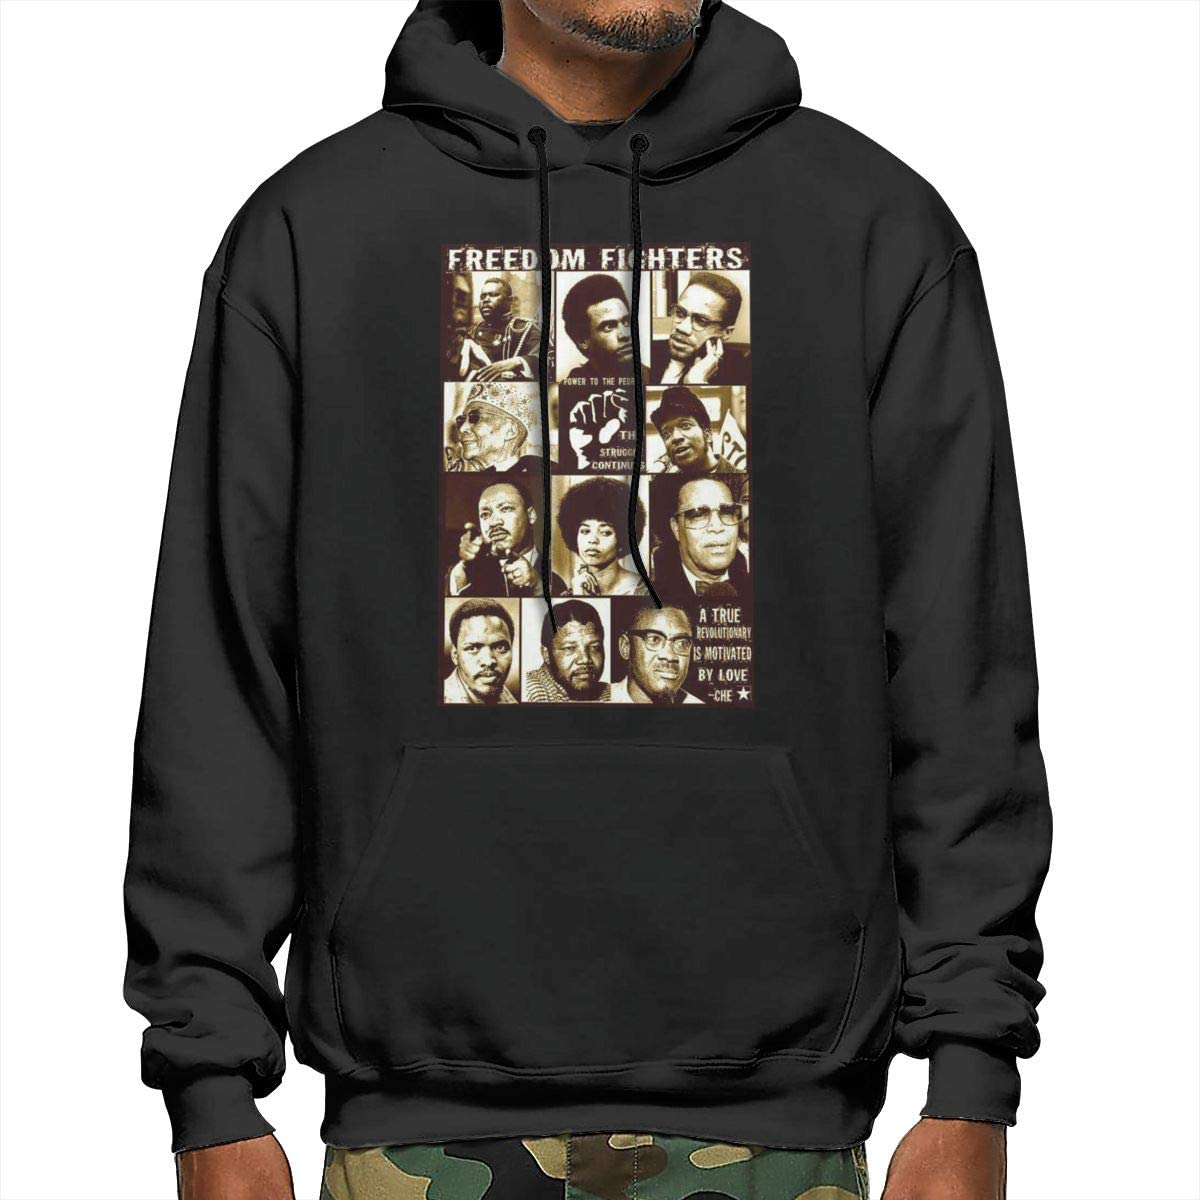 J4b756J Mens Harriet/_Tubman Pullover Long Sleeve Hoodies Coat Loose Casual Sweatshirts with Pocket